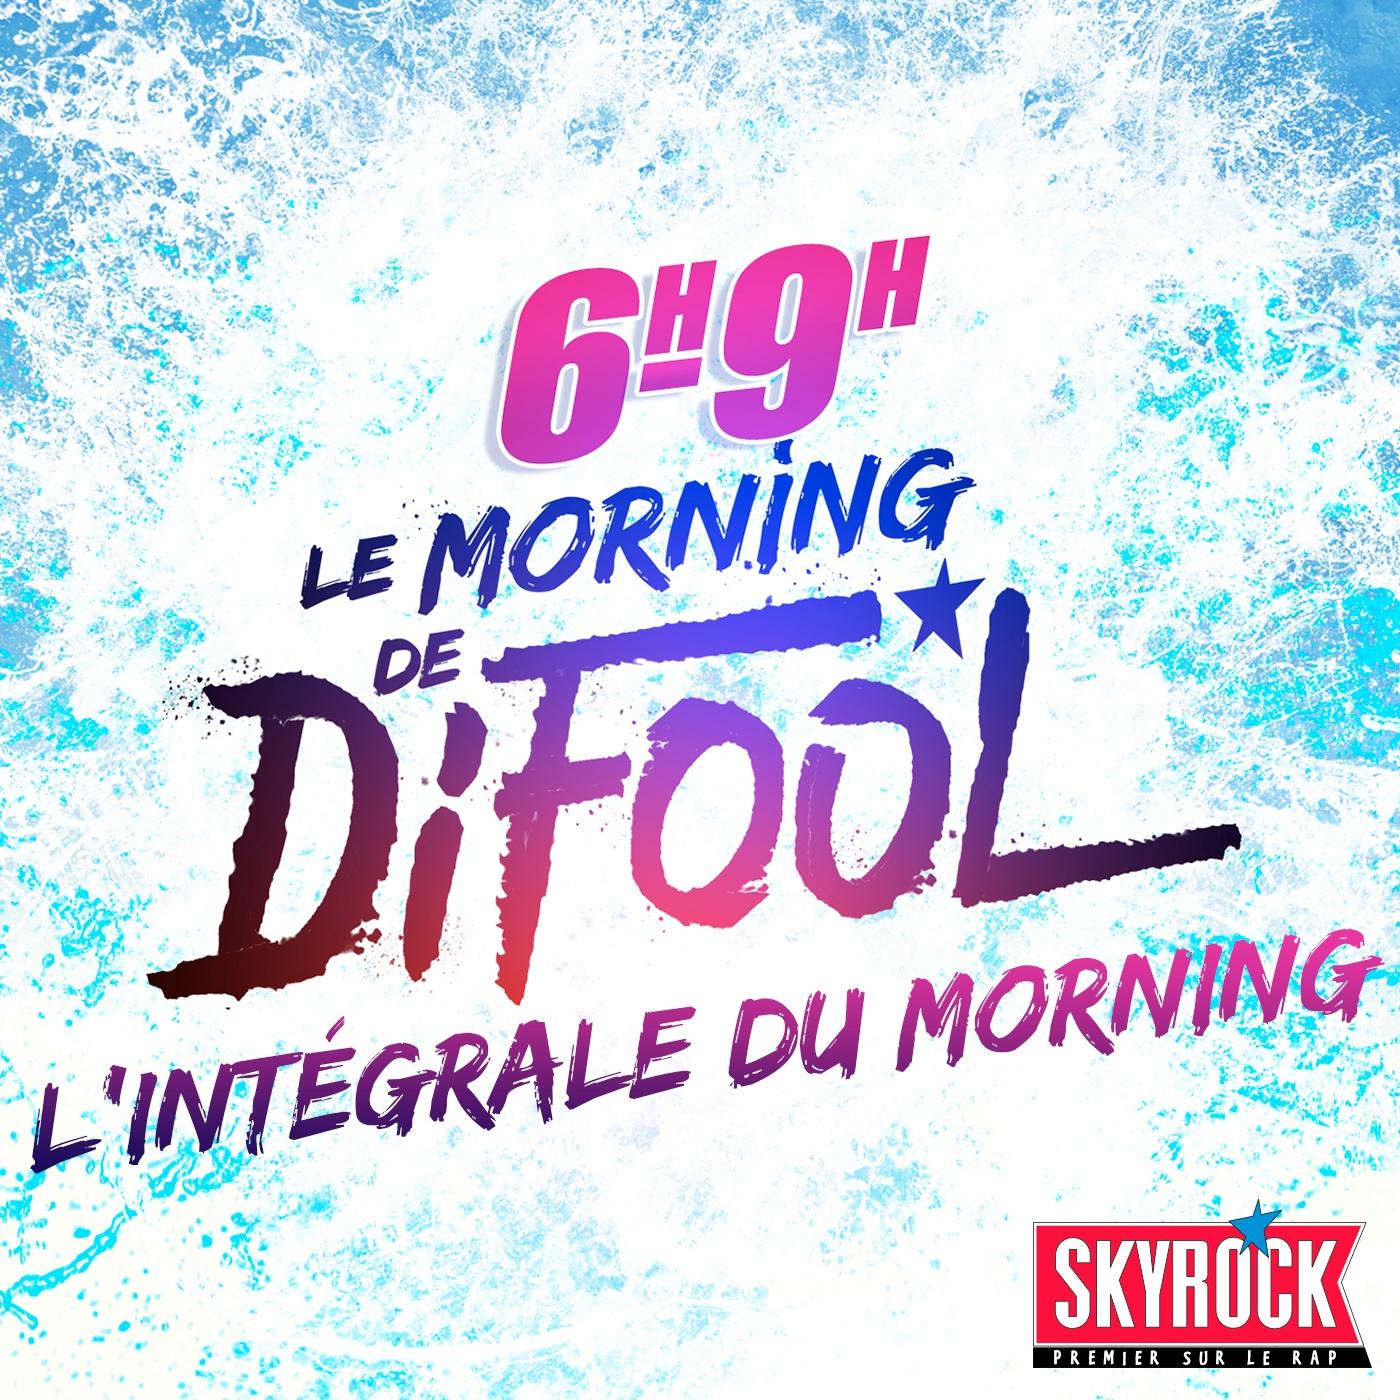 Image 1: L integrale du Morning